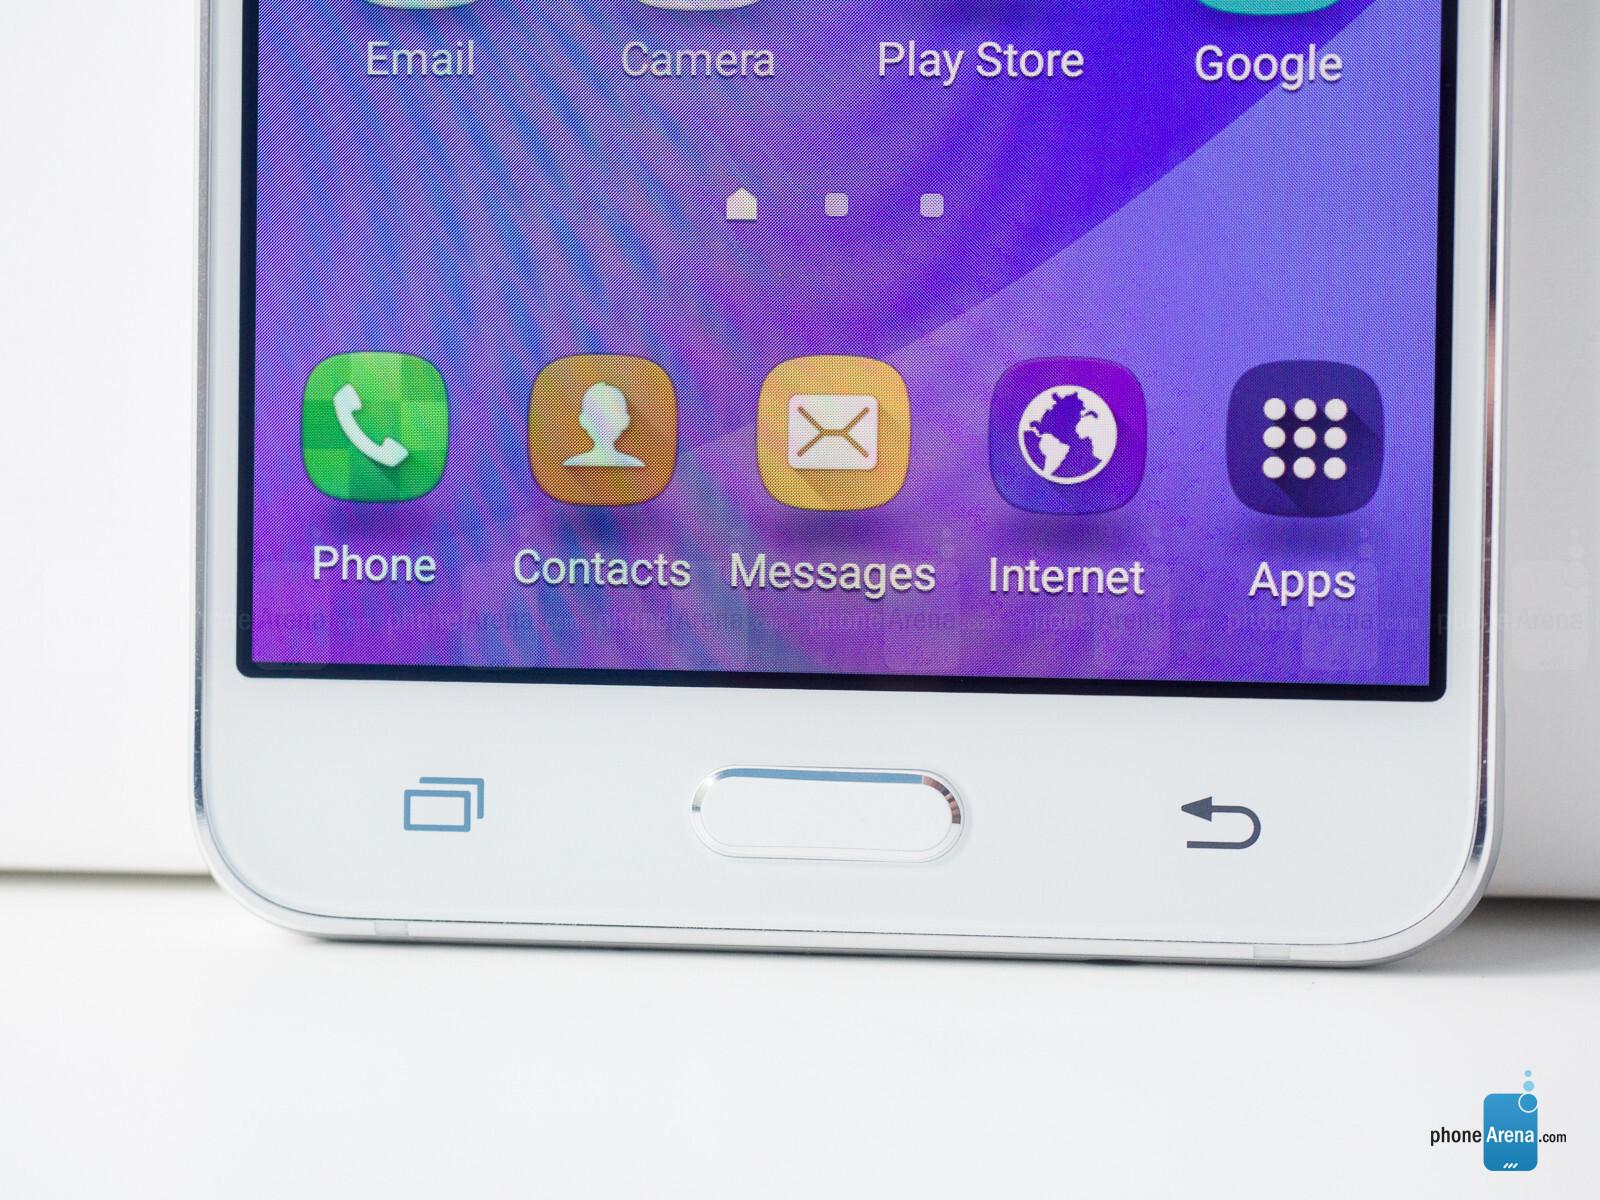 Samsung Galaxy J5 (2016) Review - PhoneArena